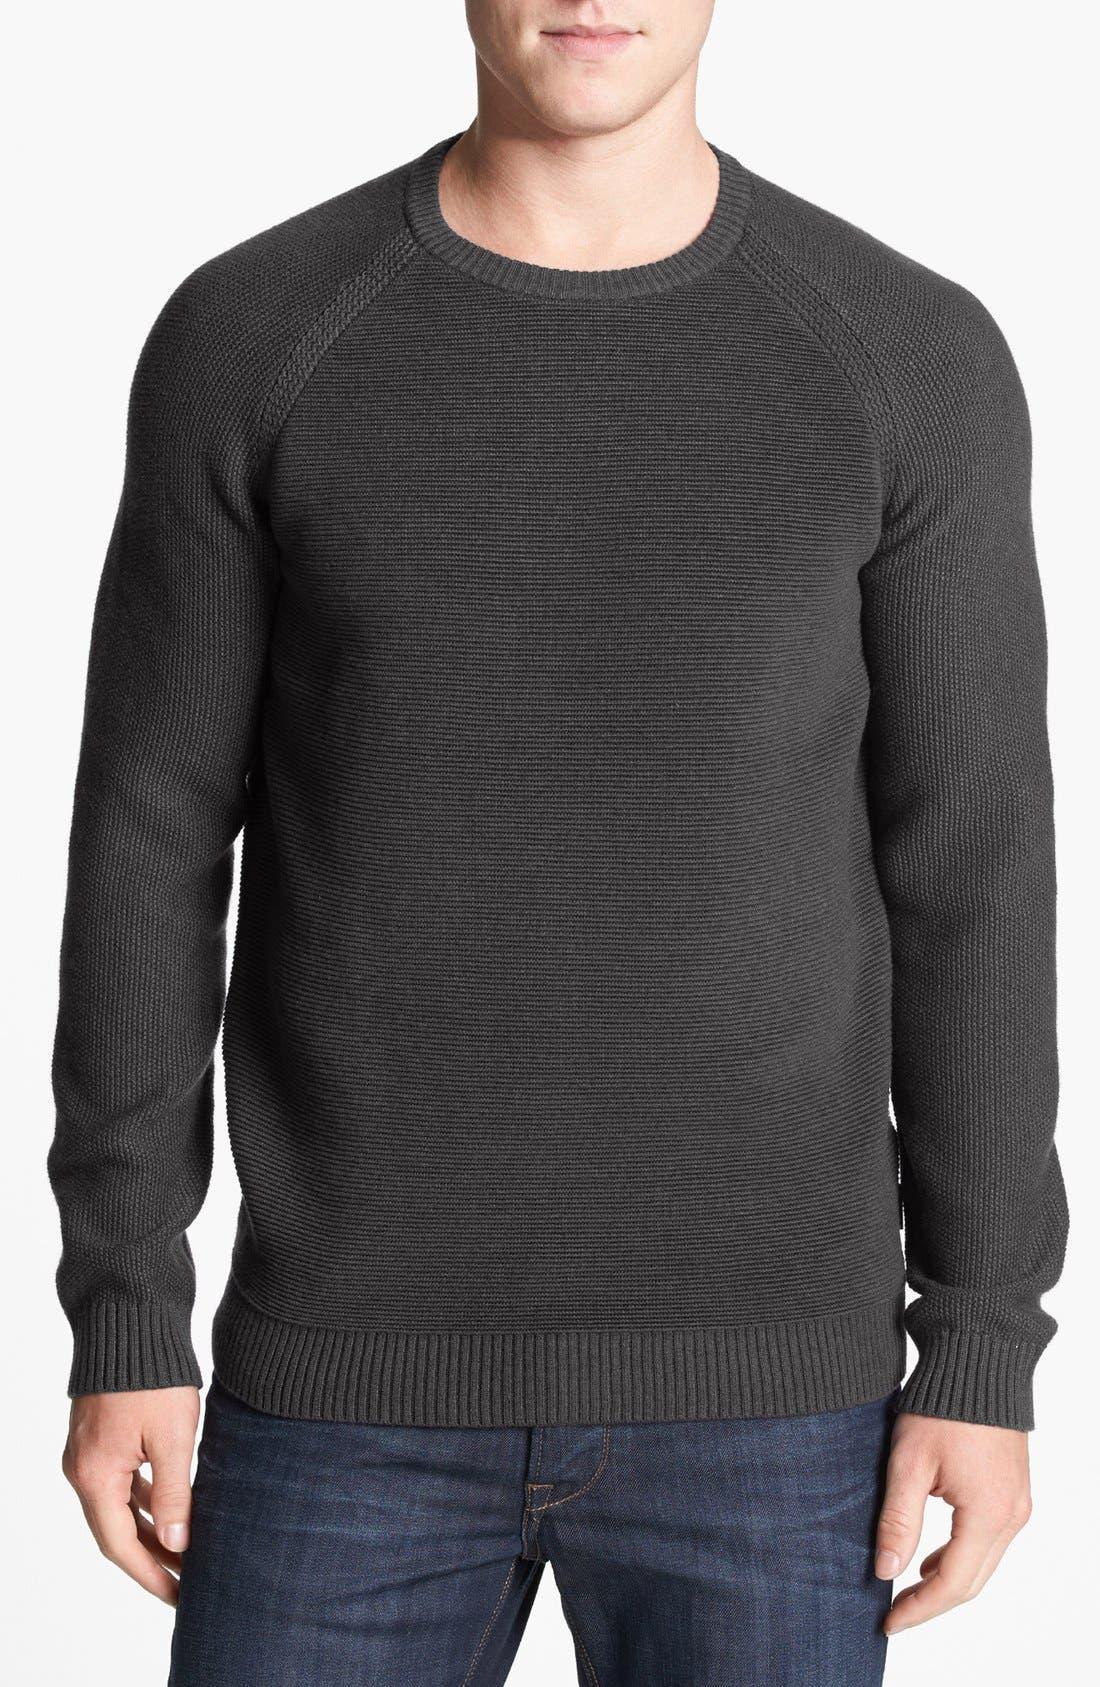 Main Image - Ted Baker London 'Malvern' Crewneck Sweater